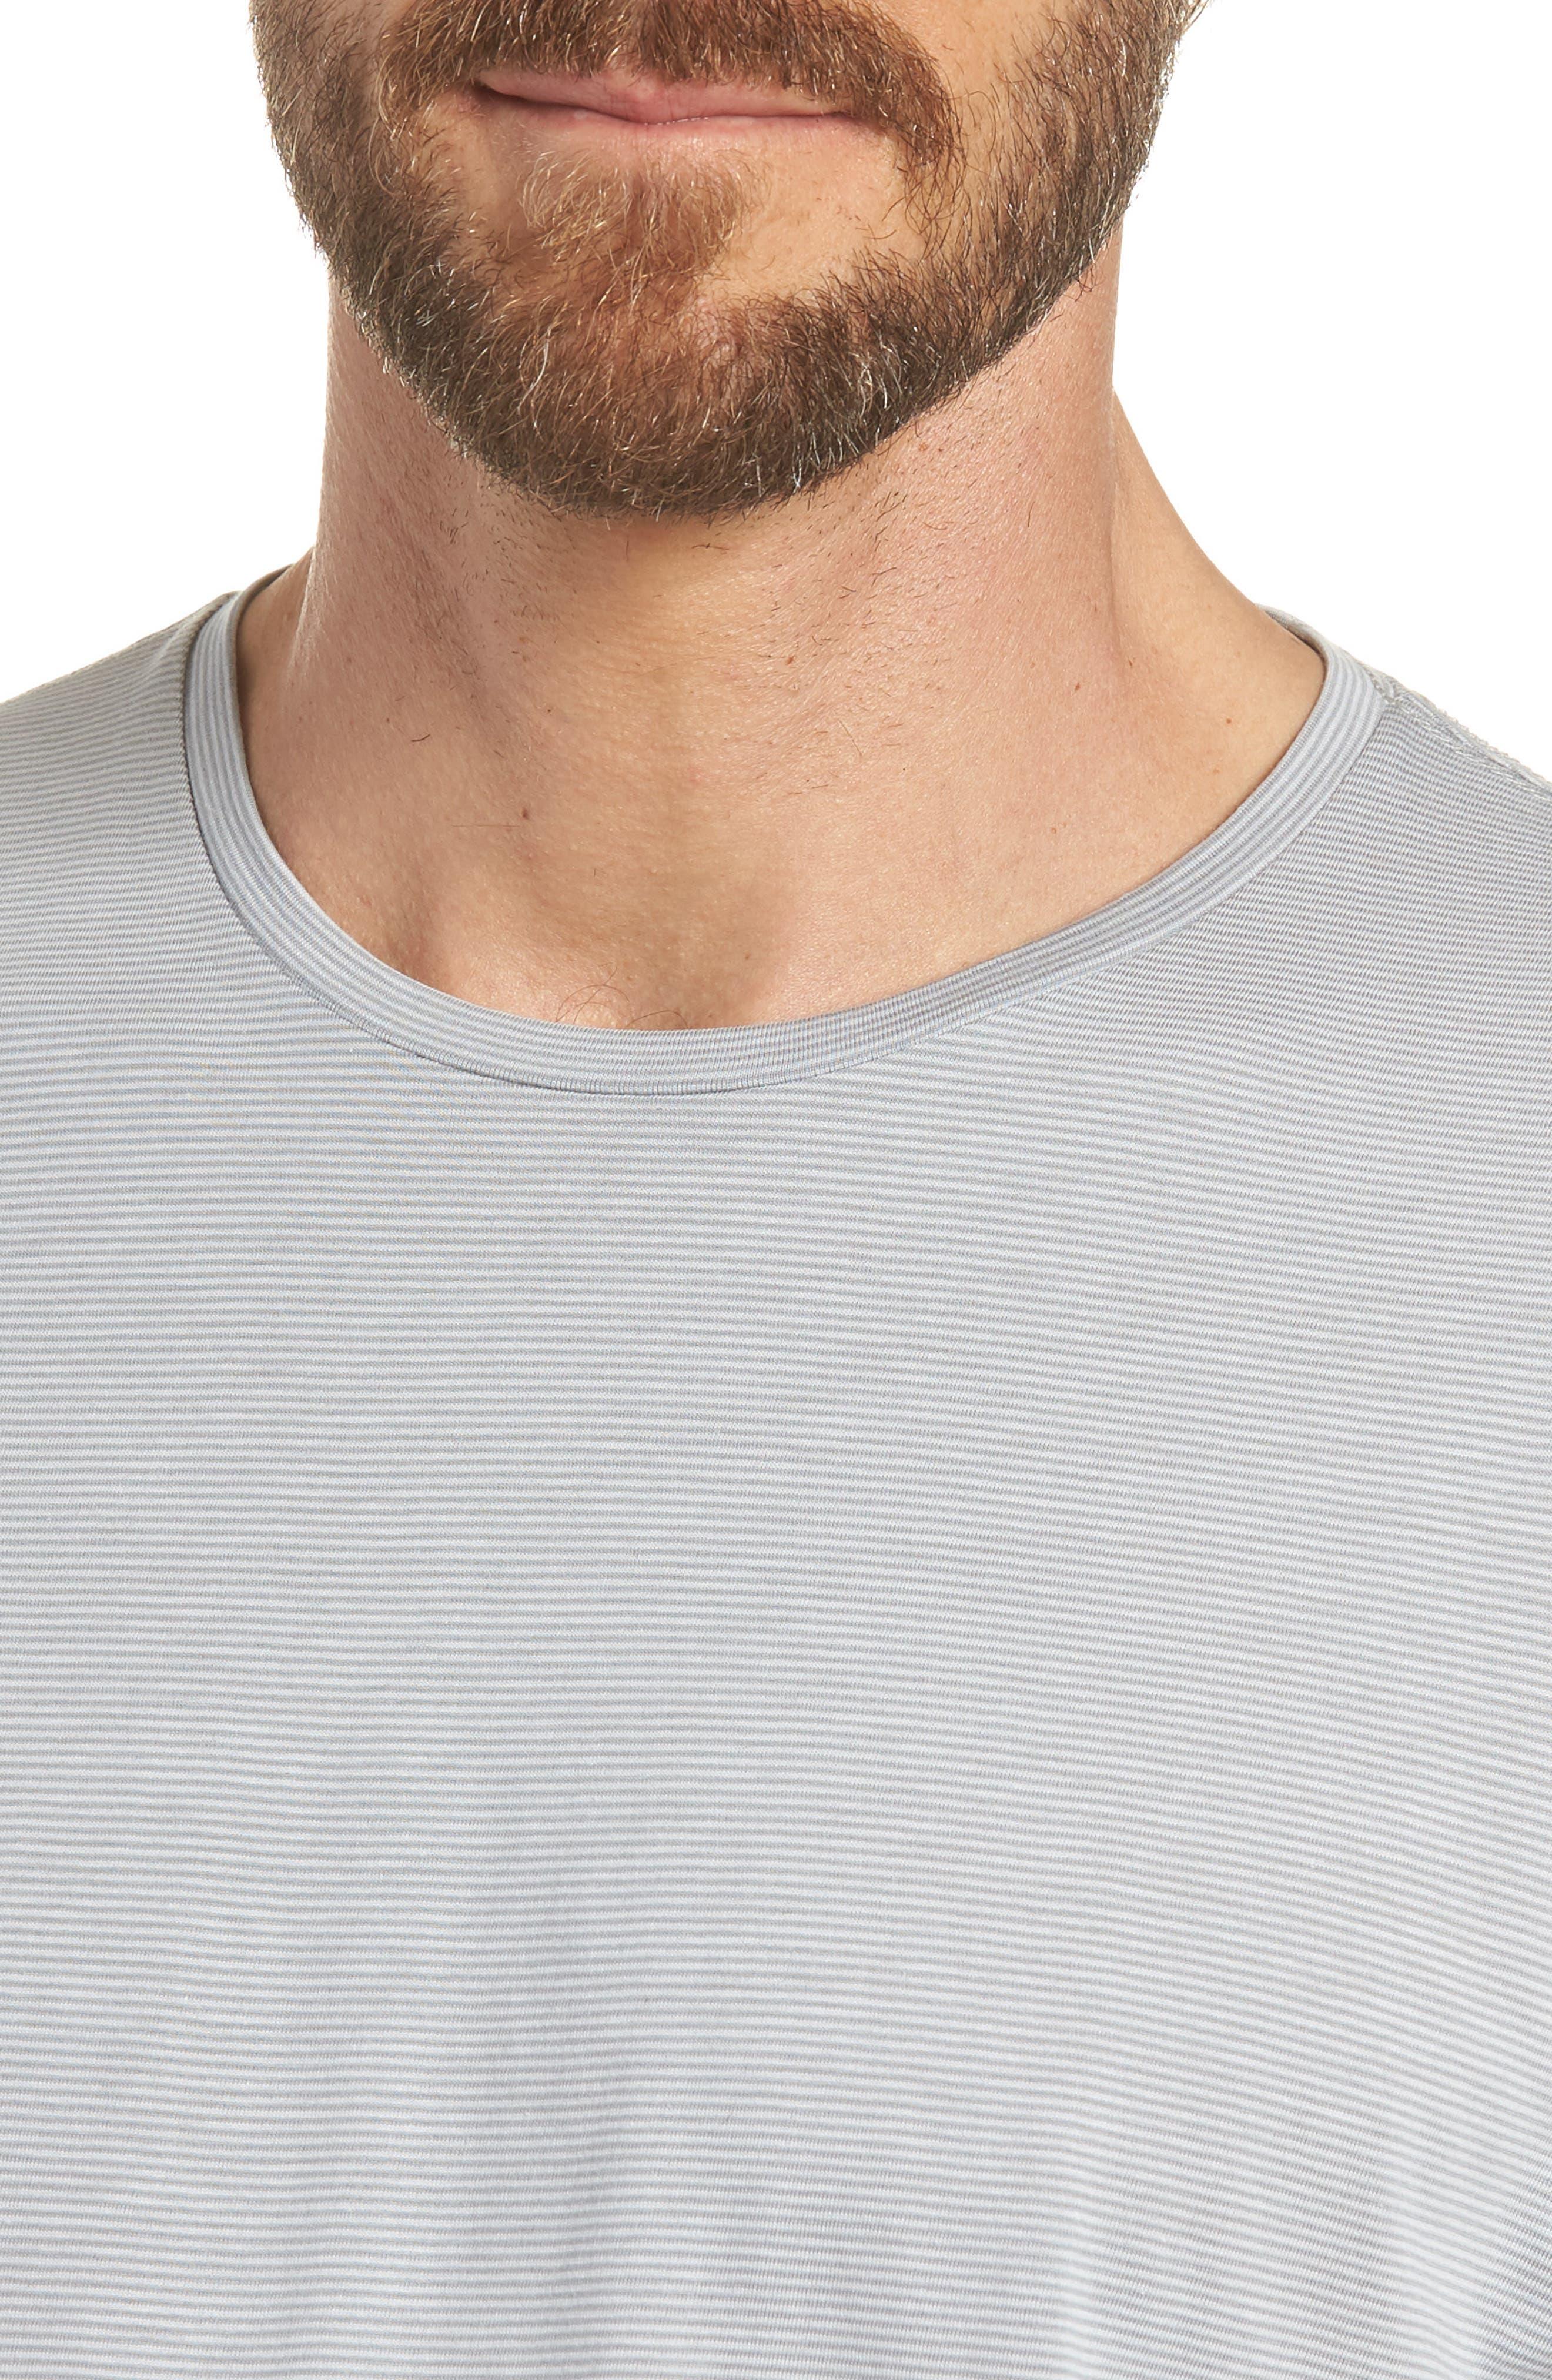 Refined Slim Fit T-Shirt,                             Alternate thumbnail 4, color,                             020